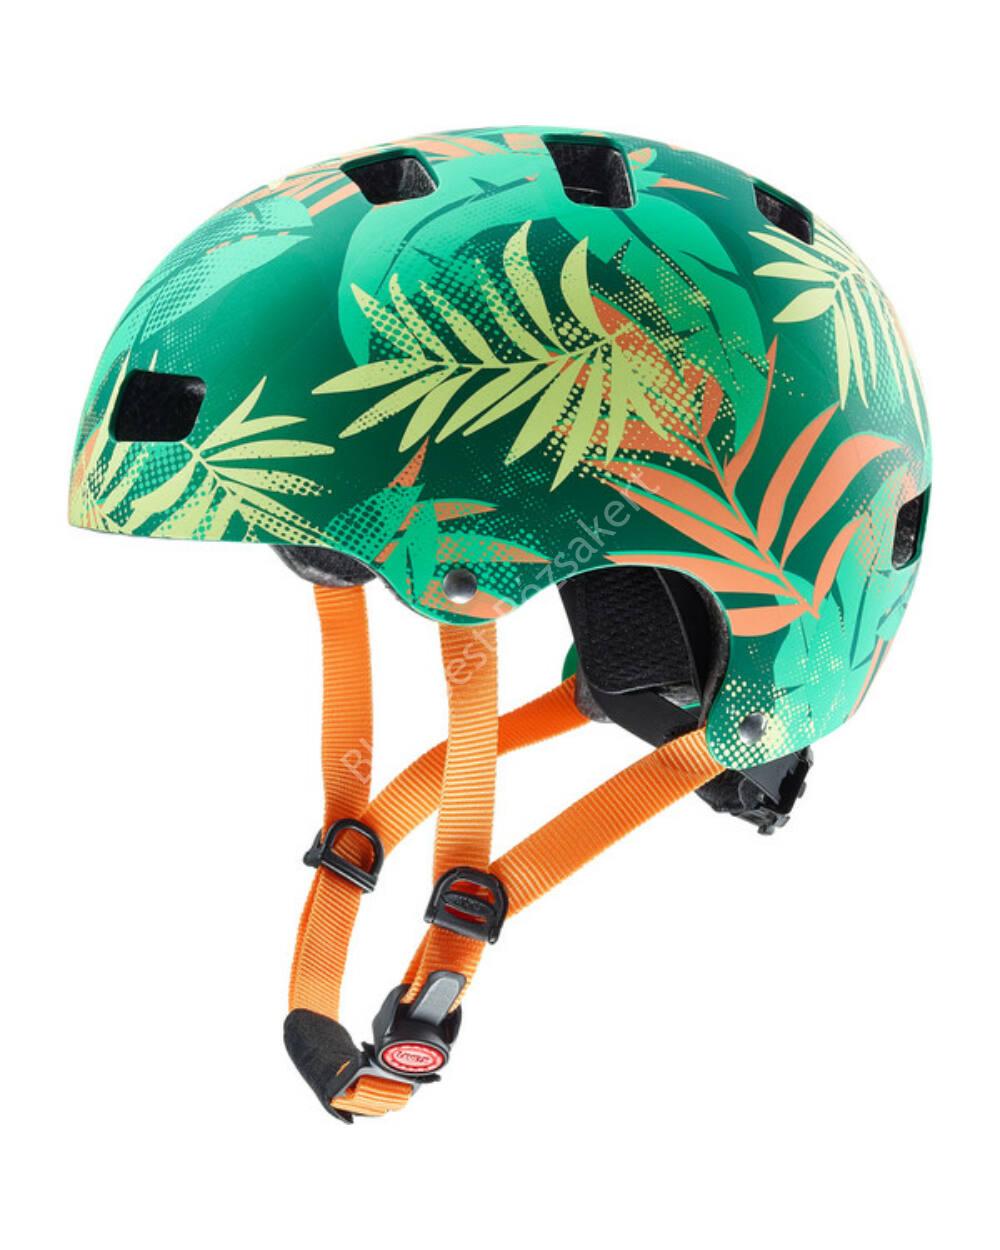 Uvex kid 3 CC dirtbike bukósisak, green-orange, 55-58 cm